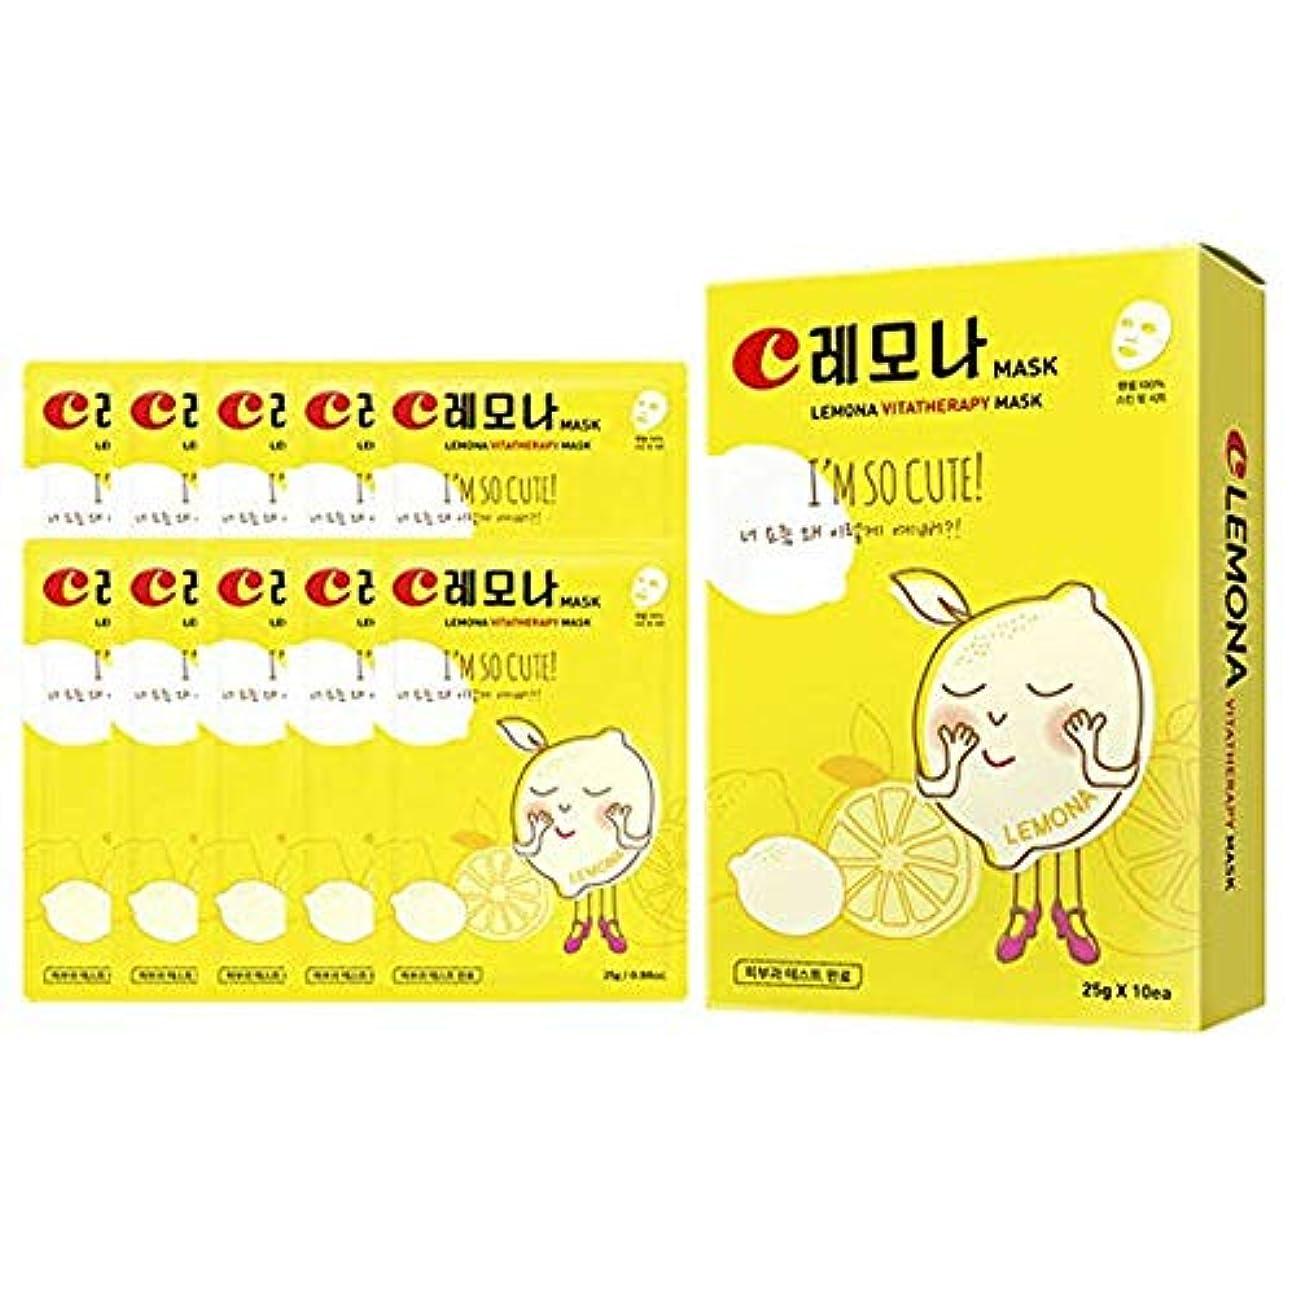 [MISOWEOL]レモナビタミンマスクパック[並行輸入品](345g) : 10ea/pack [ Lemona Vita Therapy Mask(345g) : 10ea/pack ]